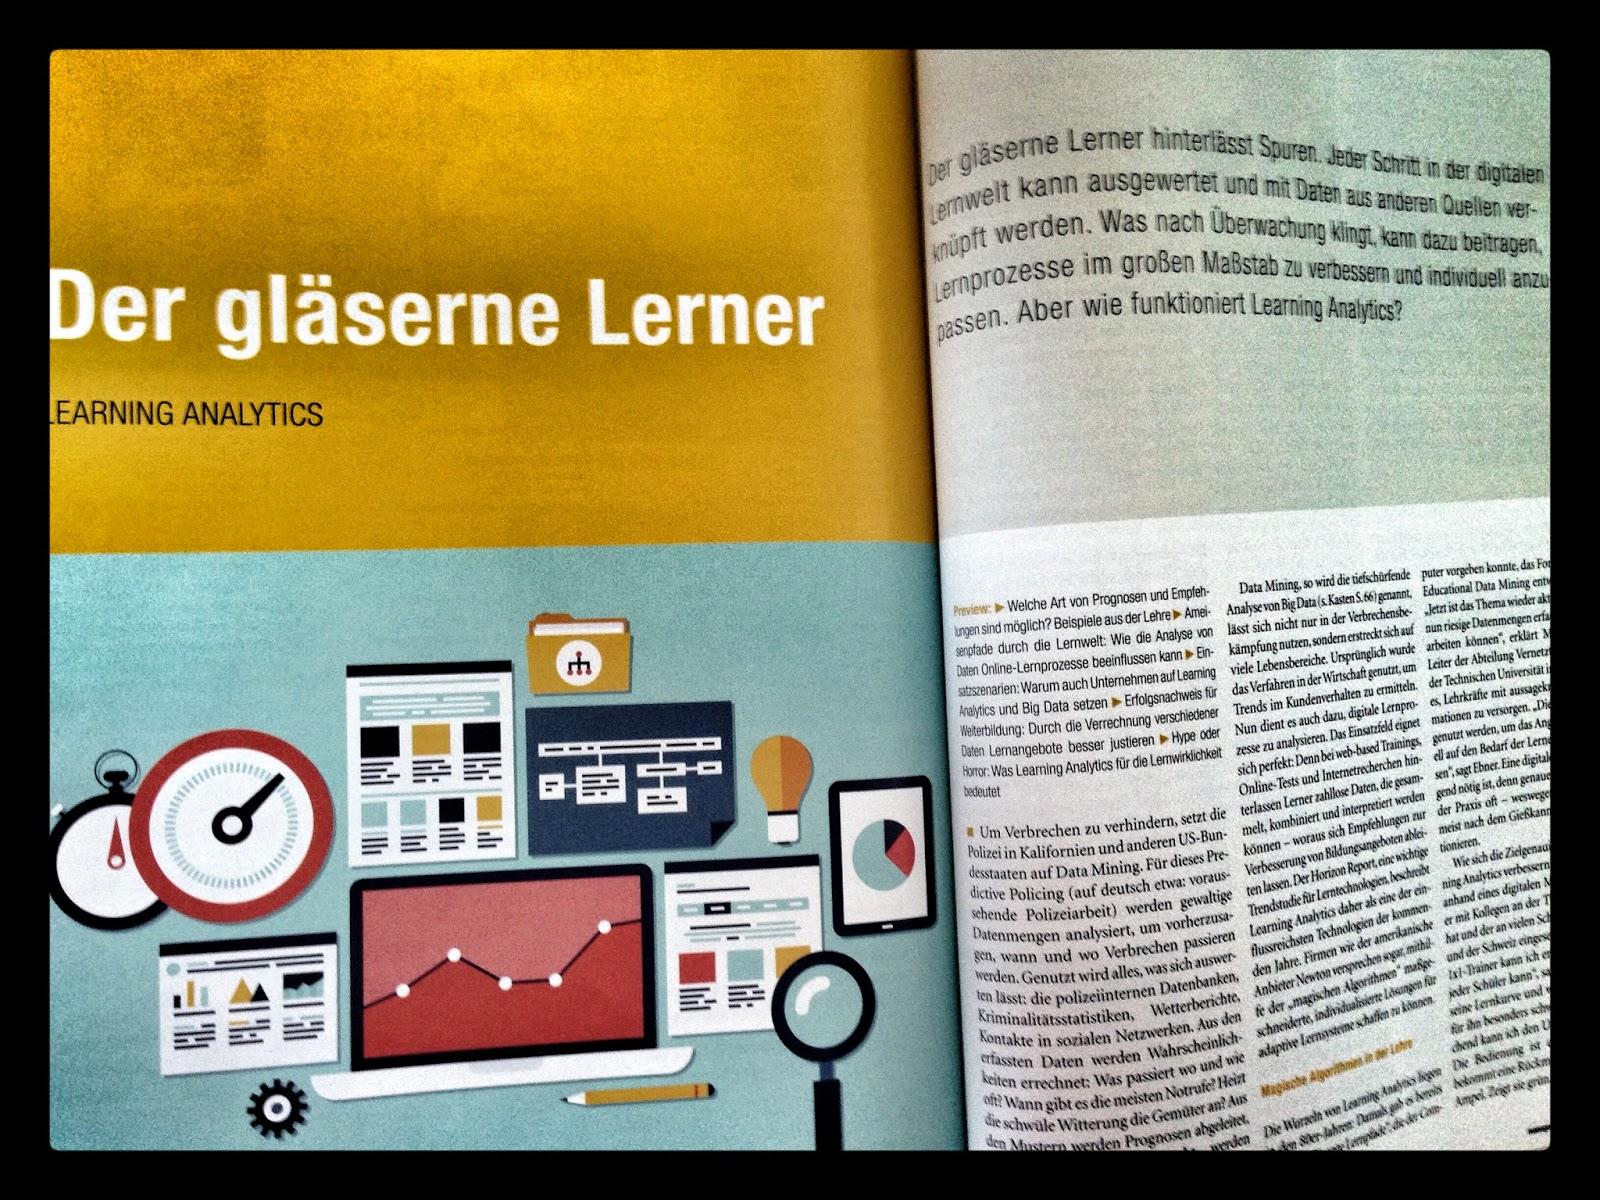 http://www.managerseminare.de/ms_Artikel/Learning-Analytics-Der-glaeserne-Lerner,233051